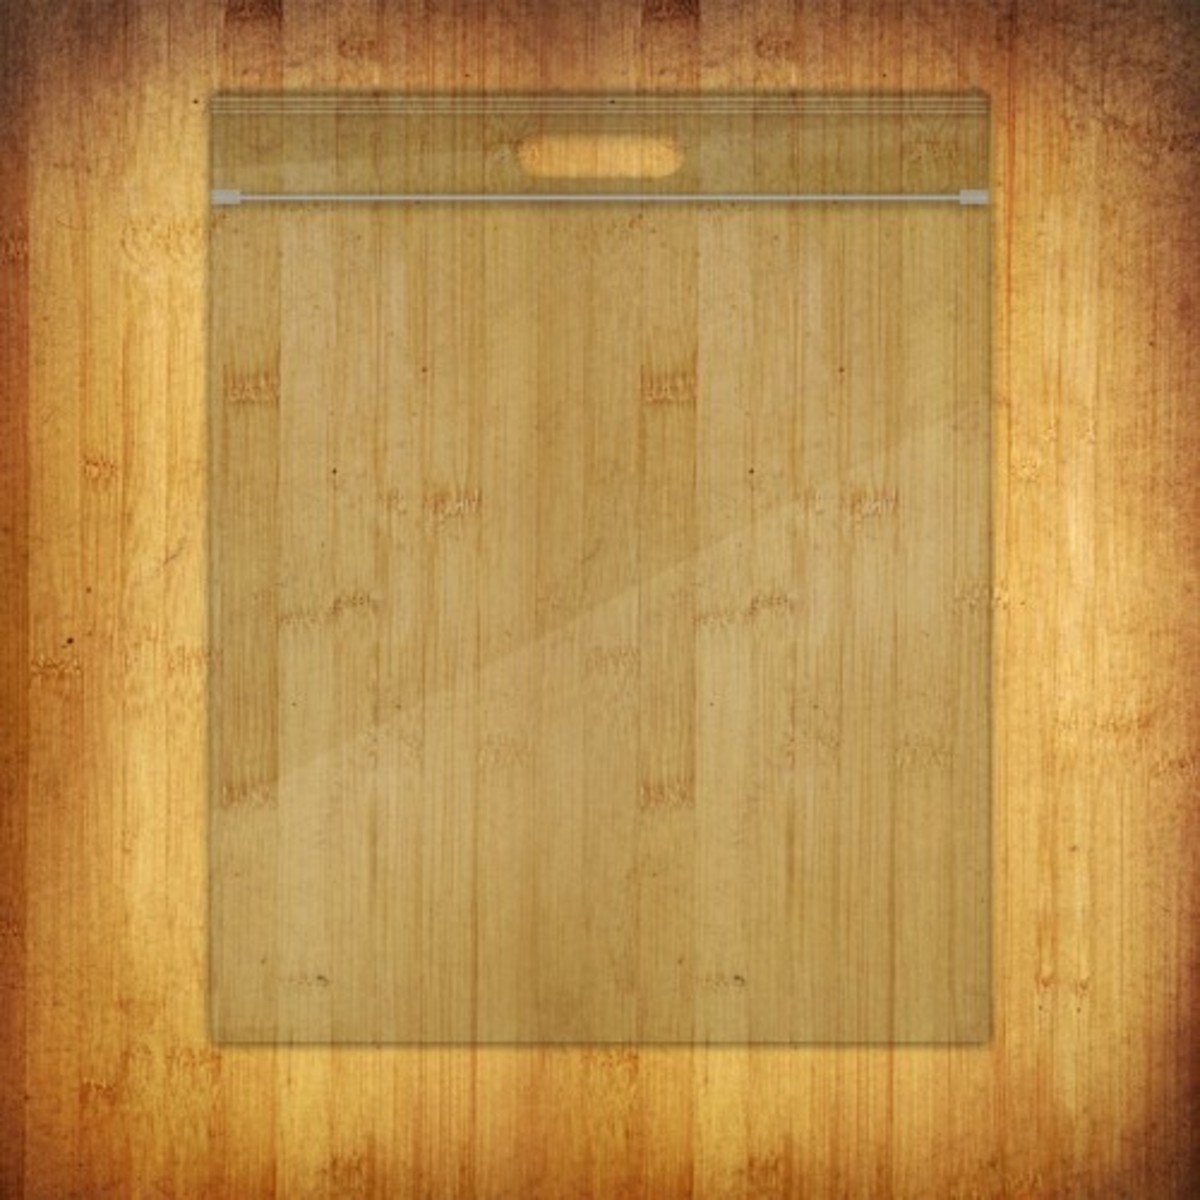 PP空白手提夾鏈袋-008-10個裝